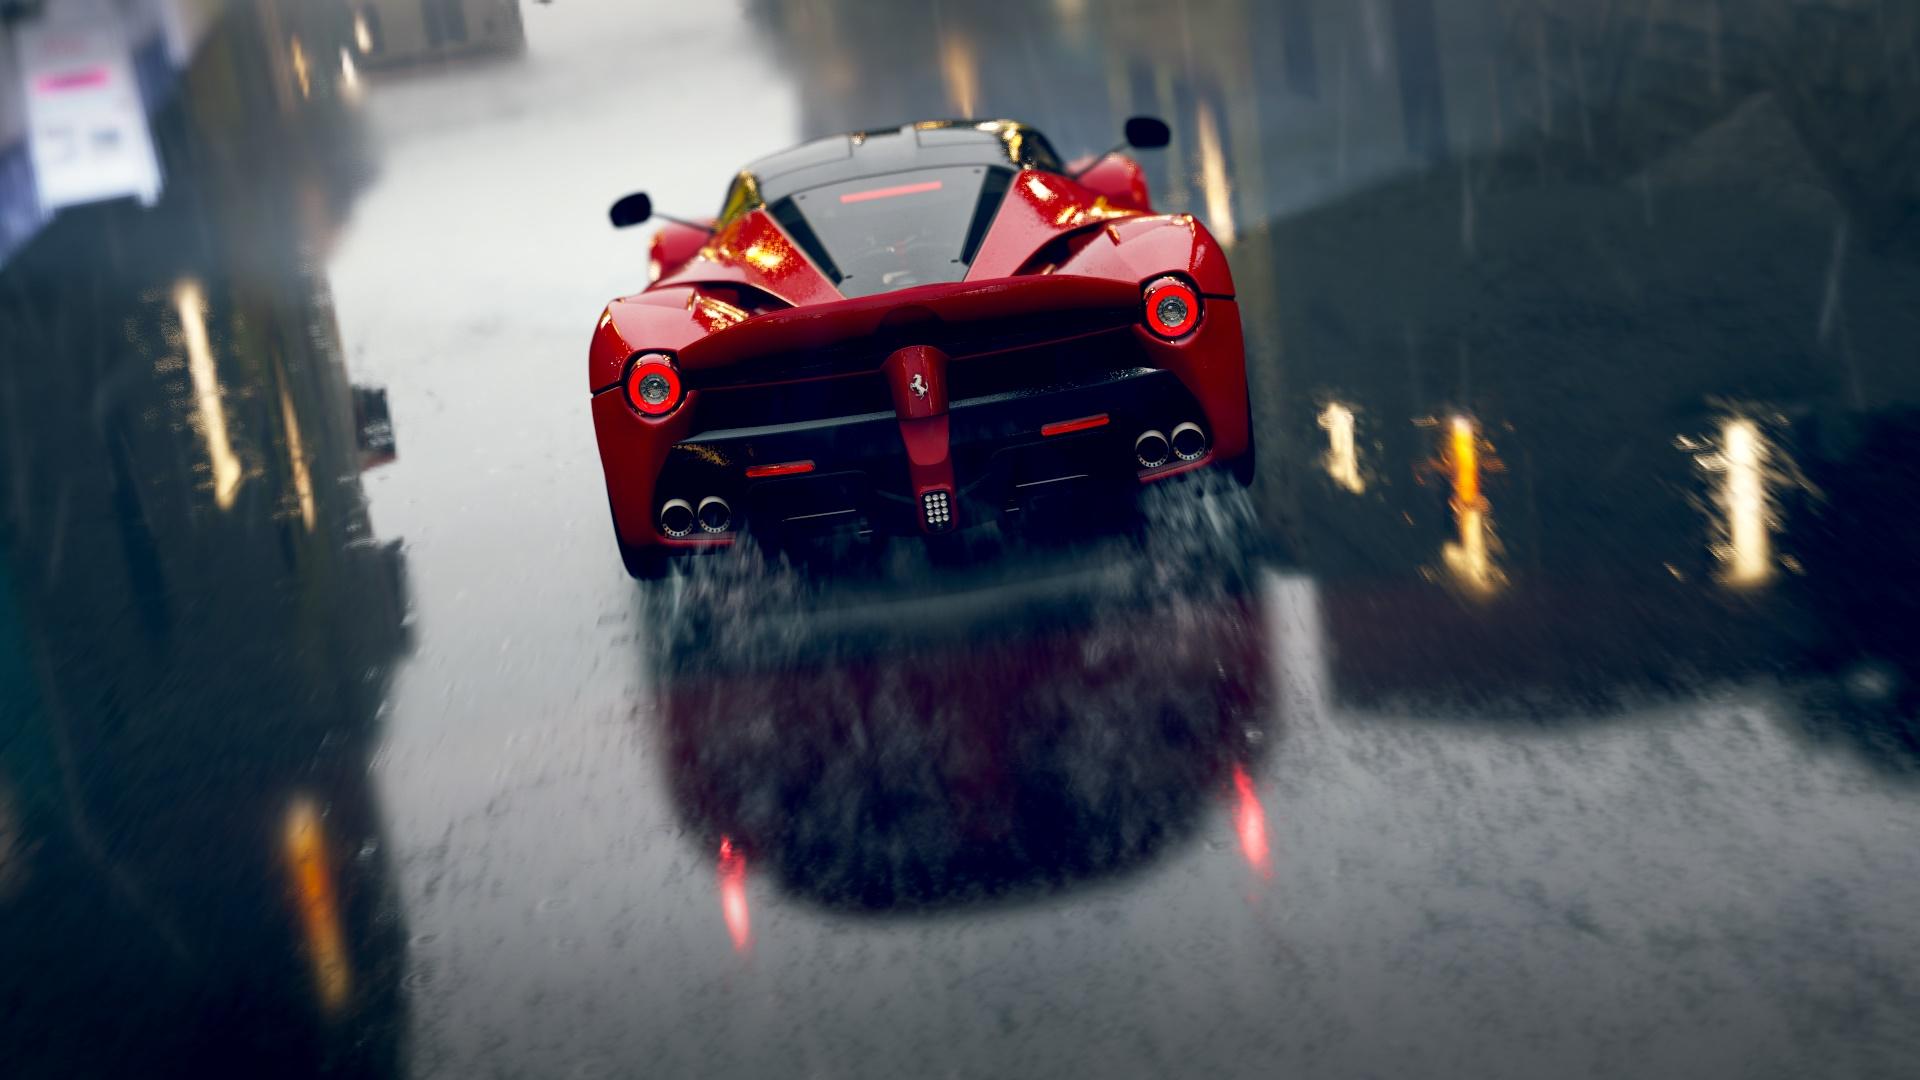 Forza Horizon 2 Red Ferrari Wallpaper 1080p 1920x1080